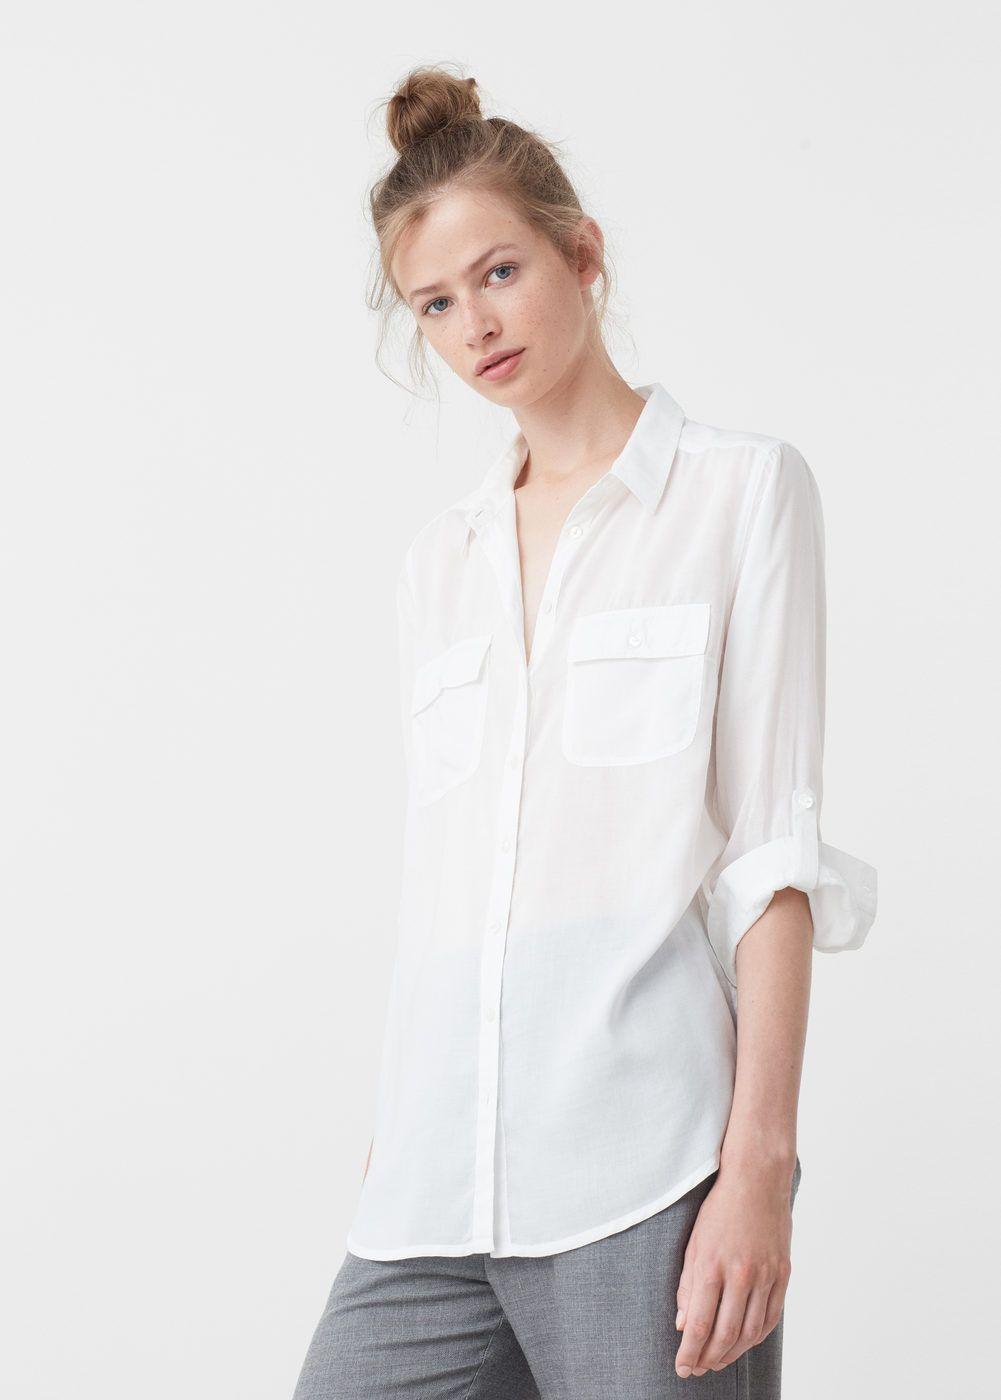 Pockets Flowy Shirt Woman Mango Fashion Clothes For Sale Fashion